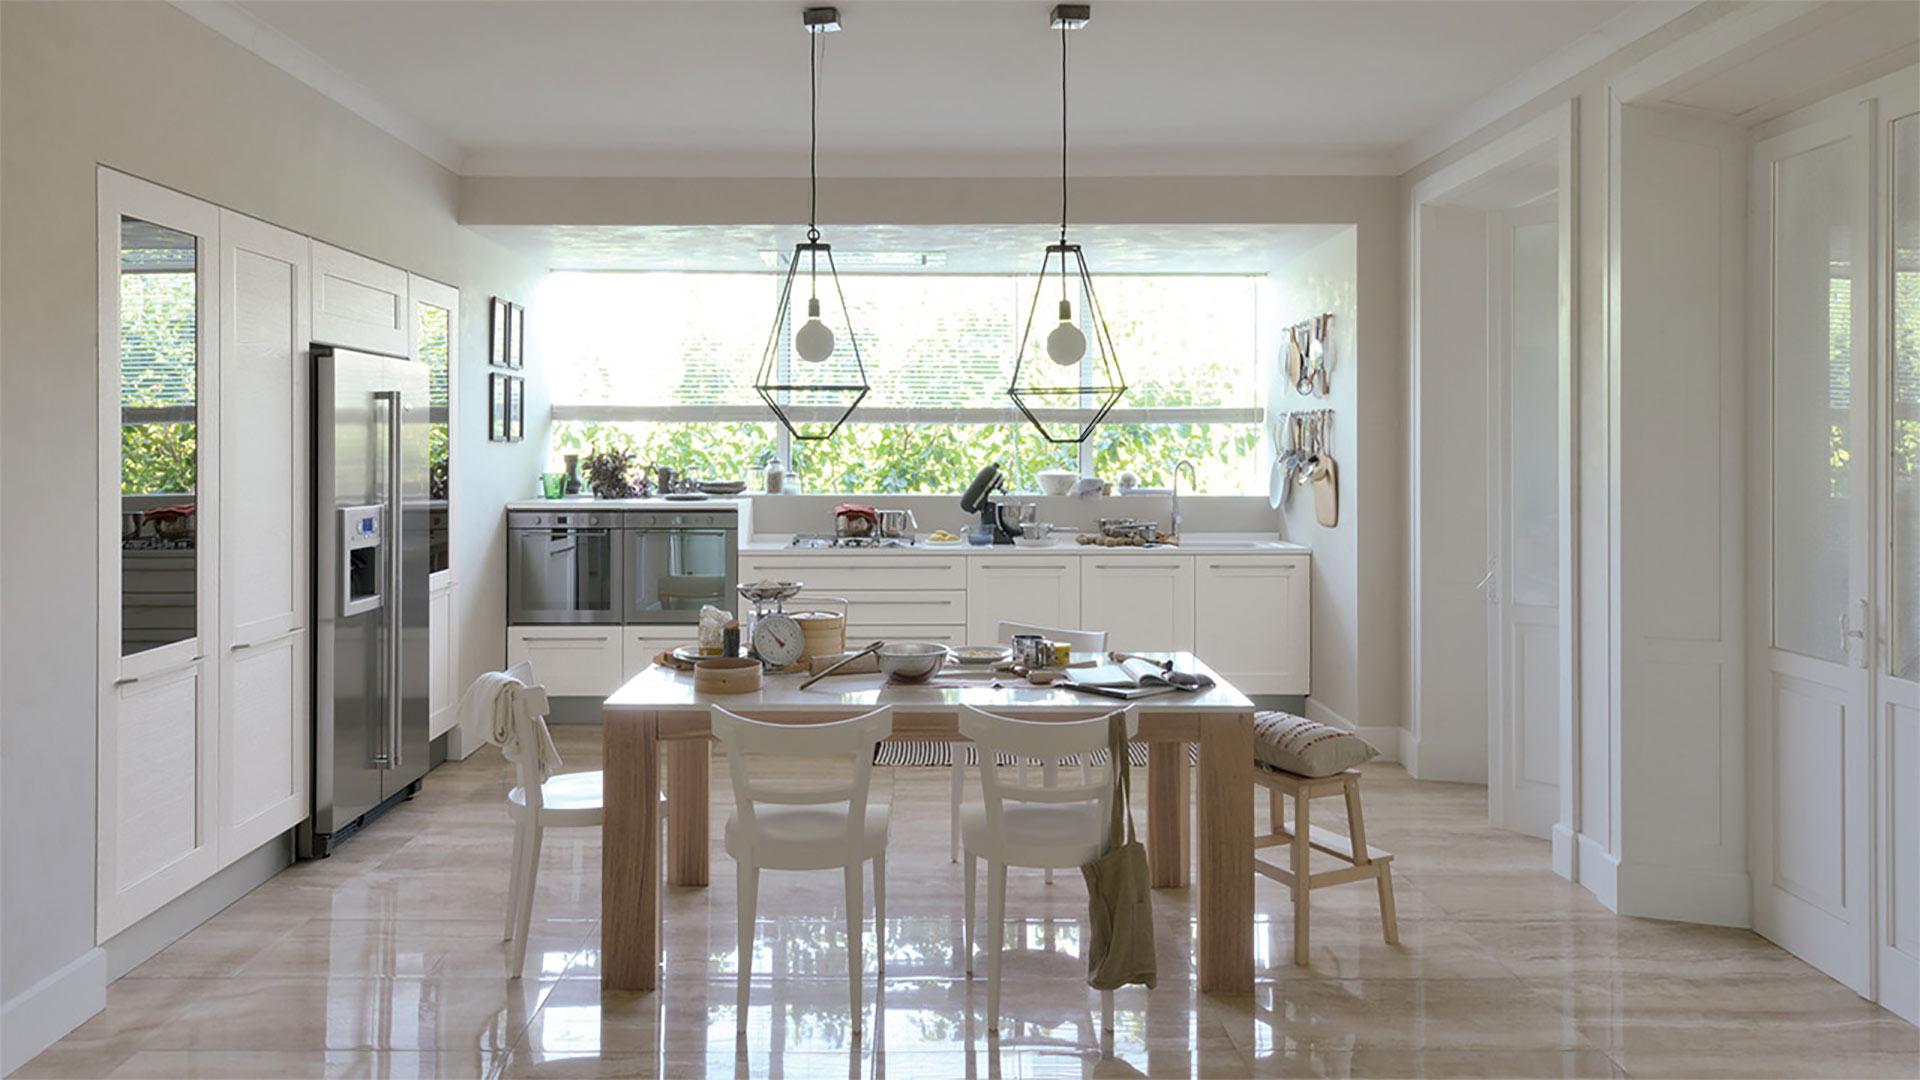 Dealers - Arredo Staff Agency - Italian Design Furniture - Molteni & C, Dada, Veneta Cucine